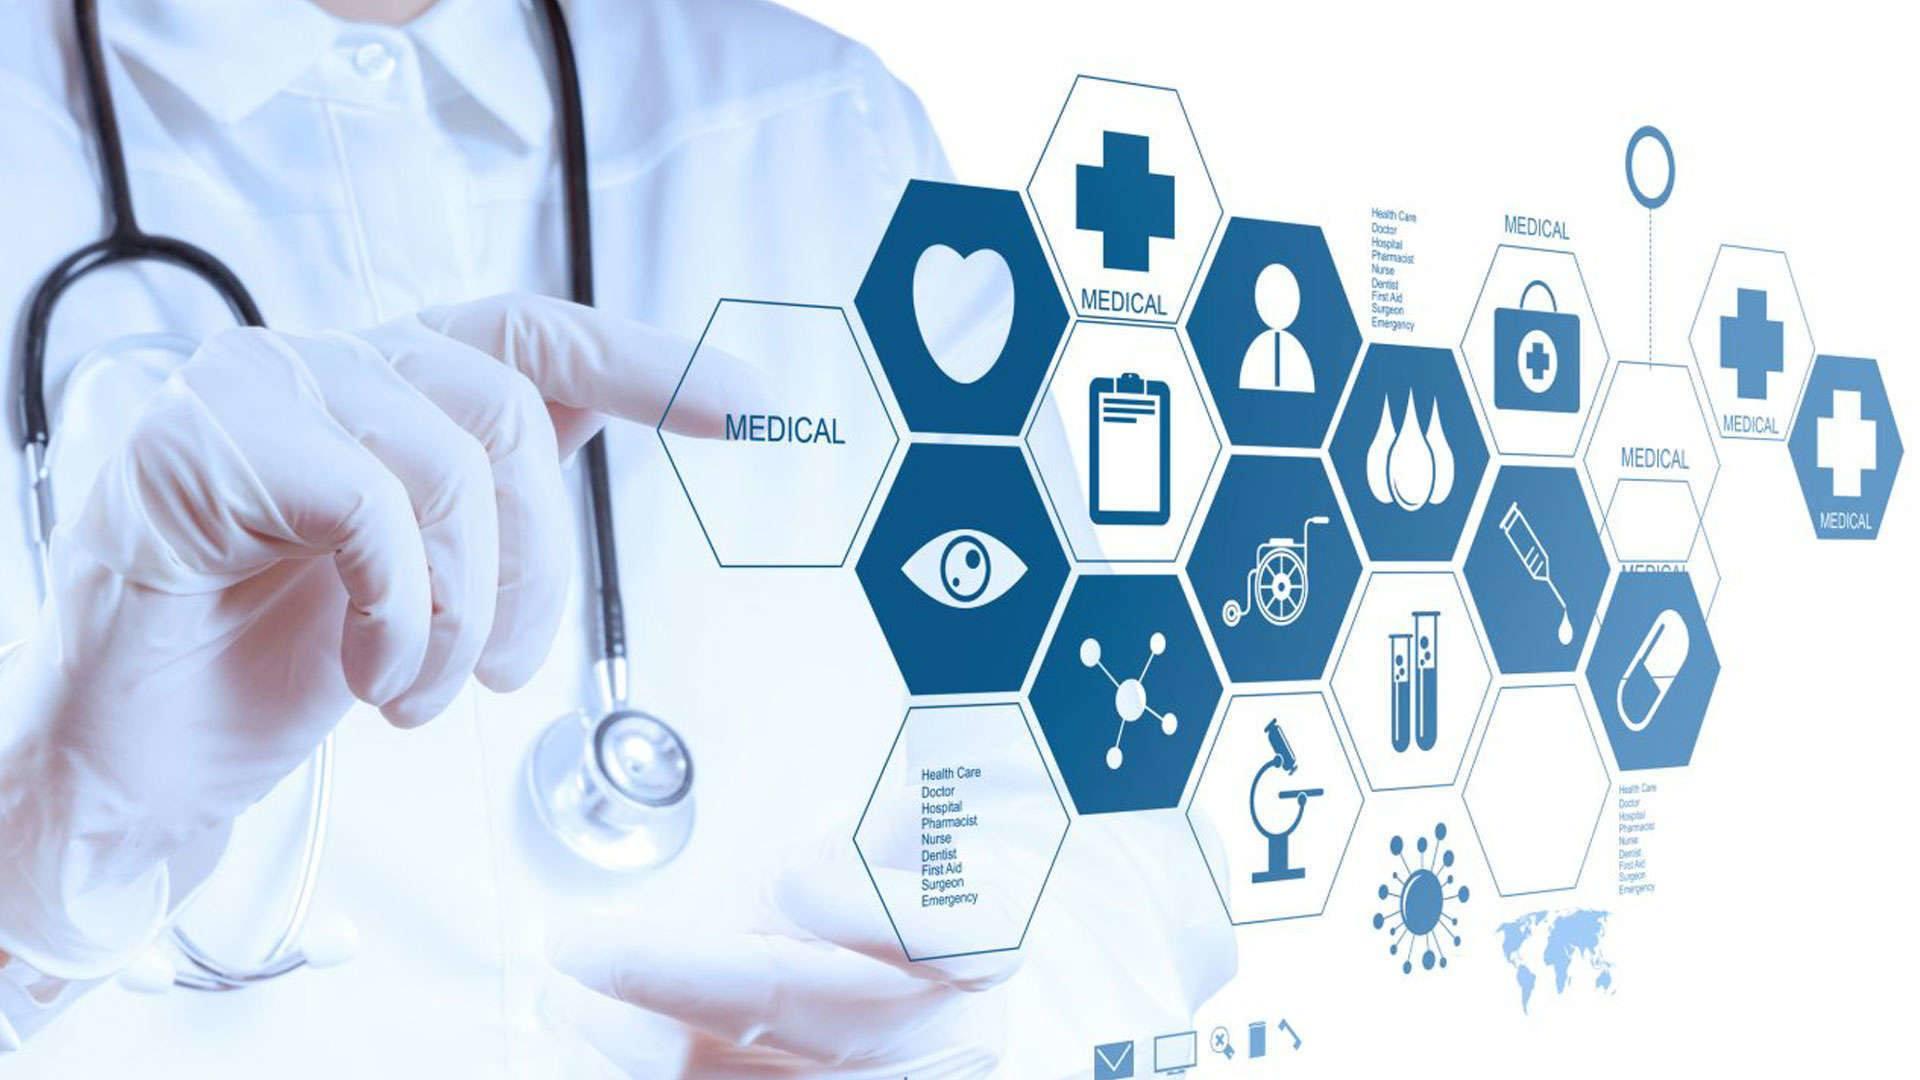 digital marketing in medical industry